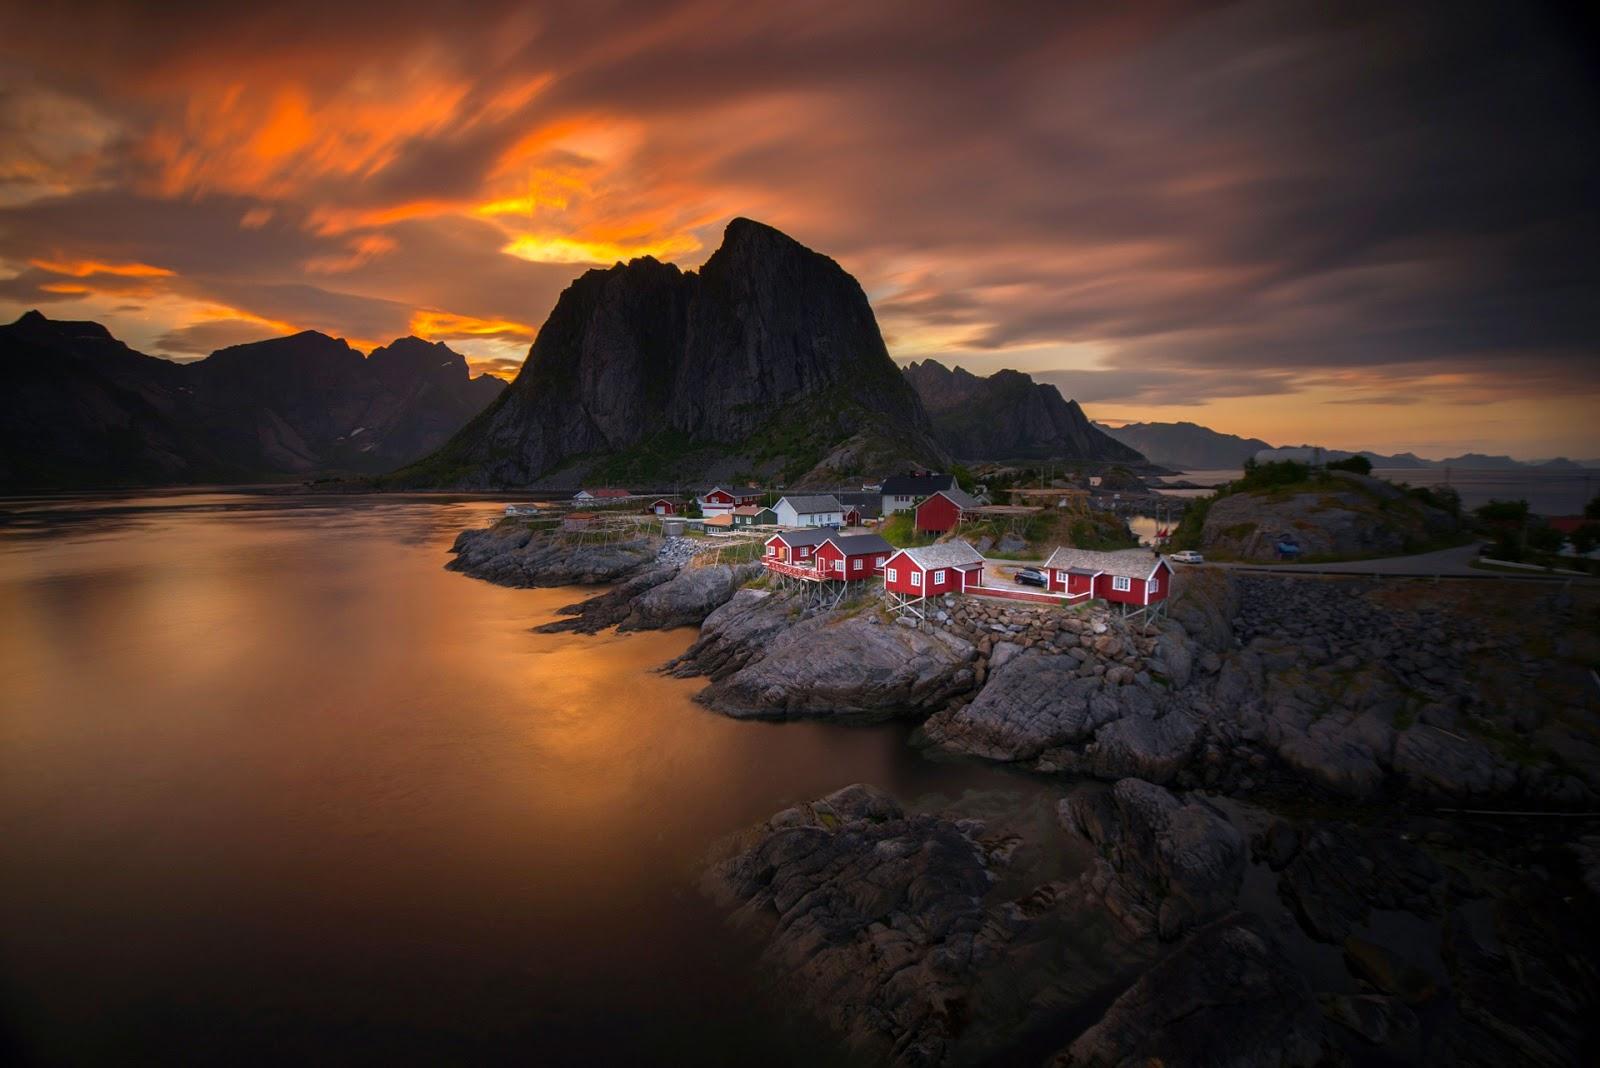 Banco de im genes gratis miradas de noruega paisajes y for Immagini full hd 1920x1080